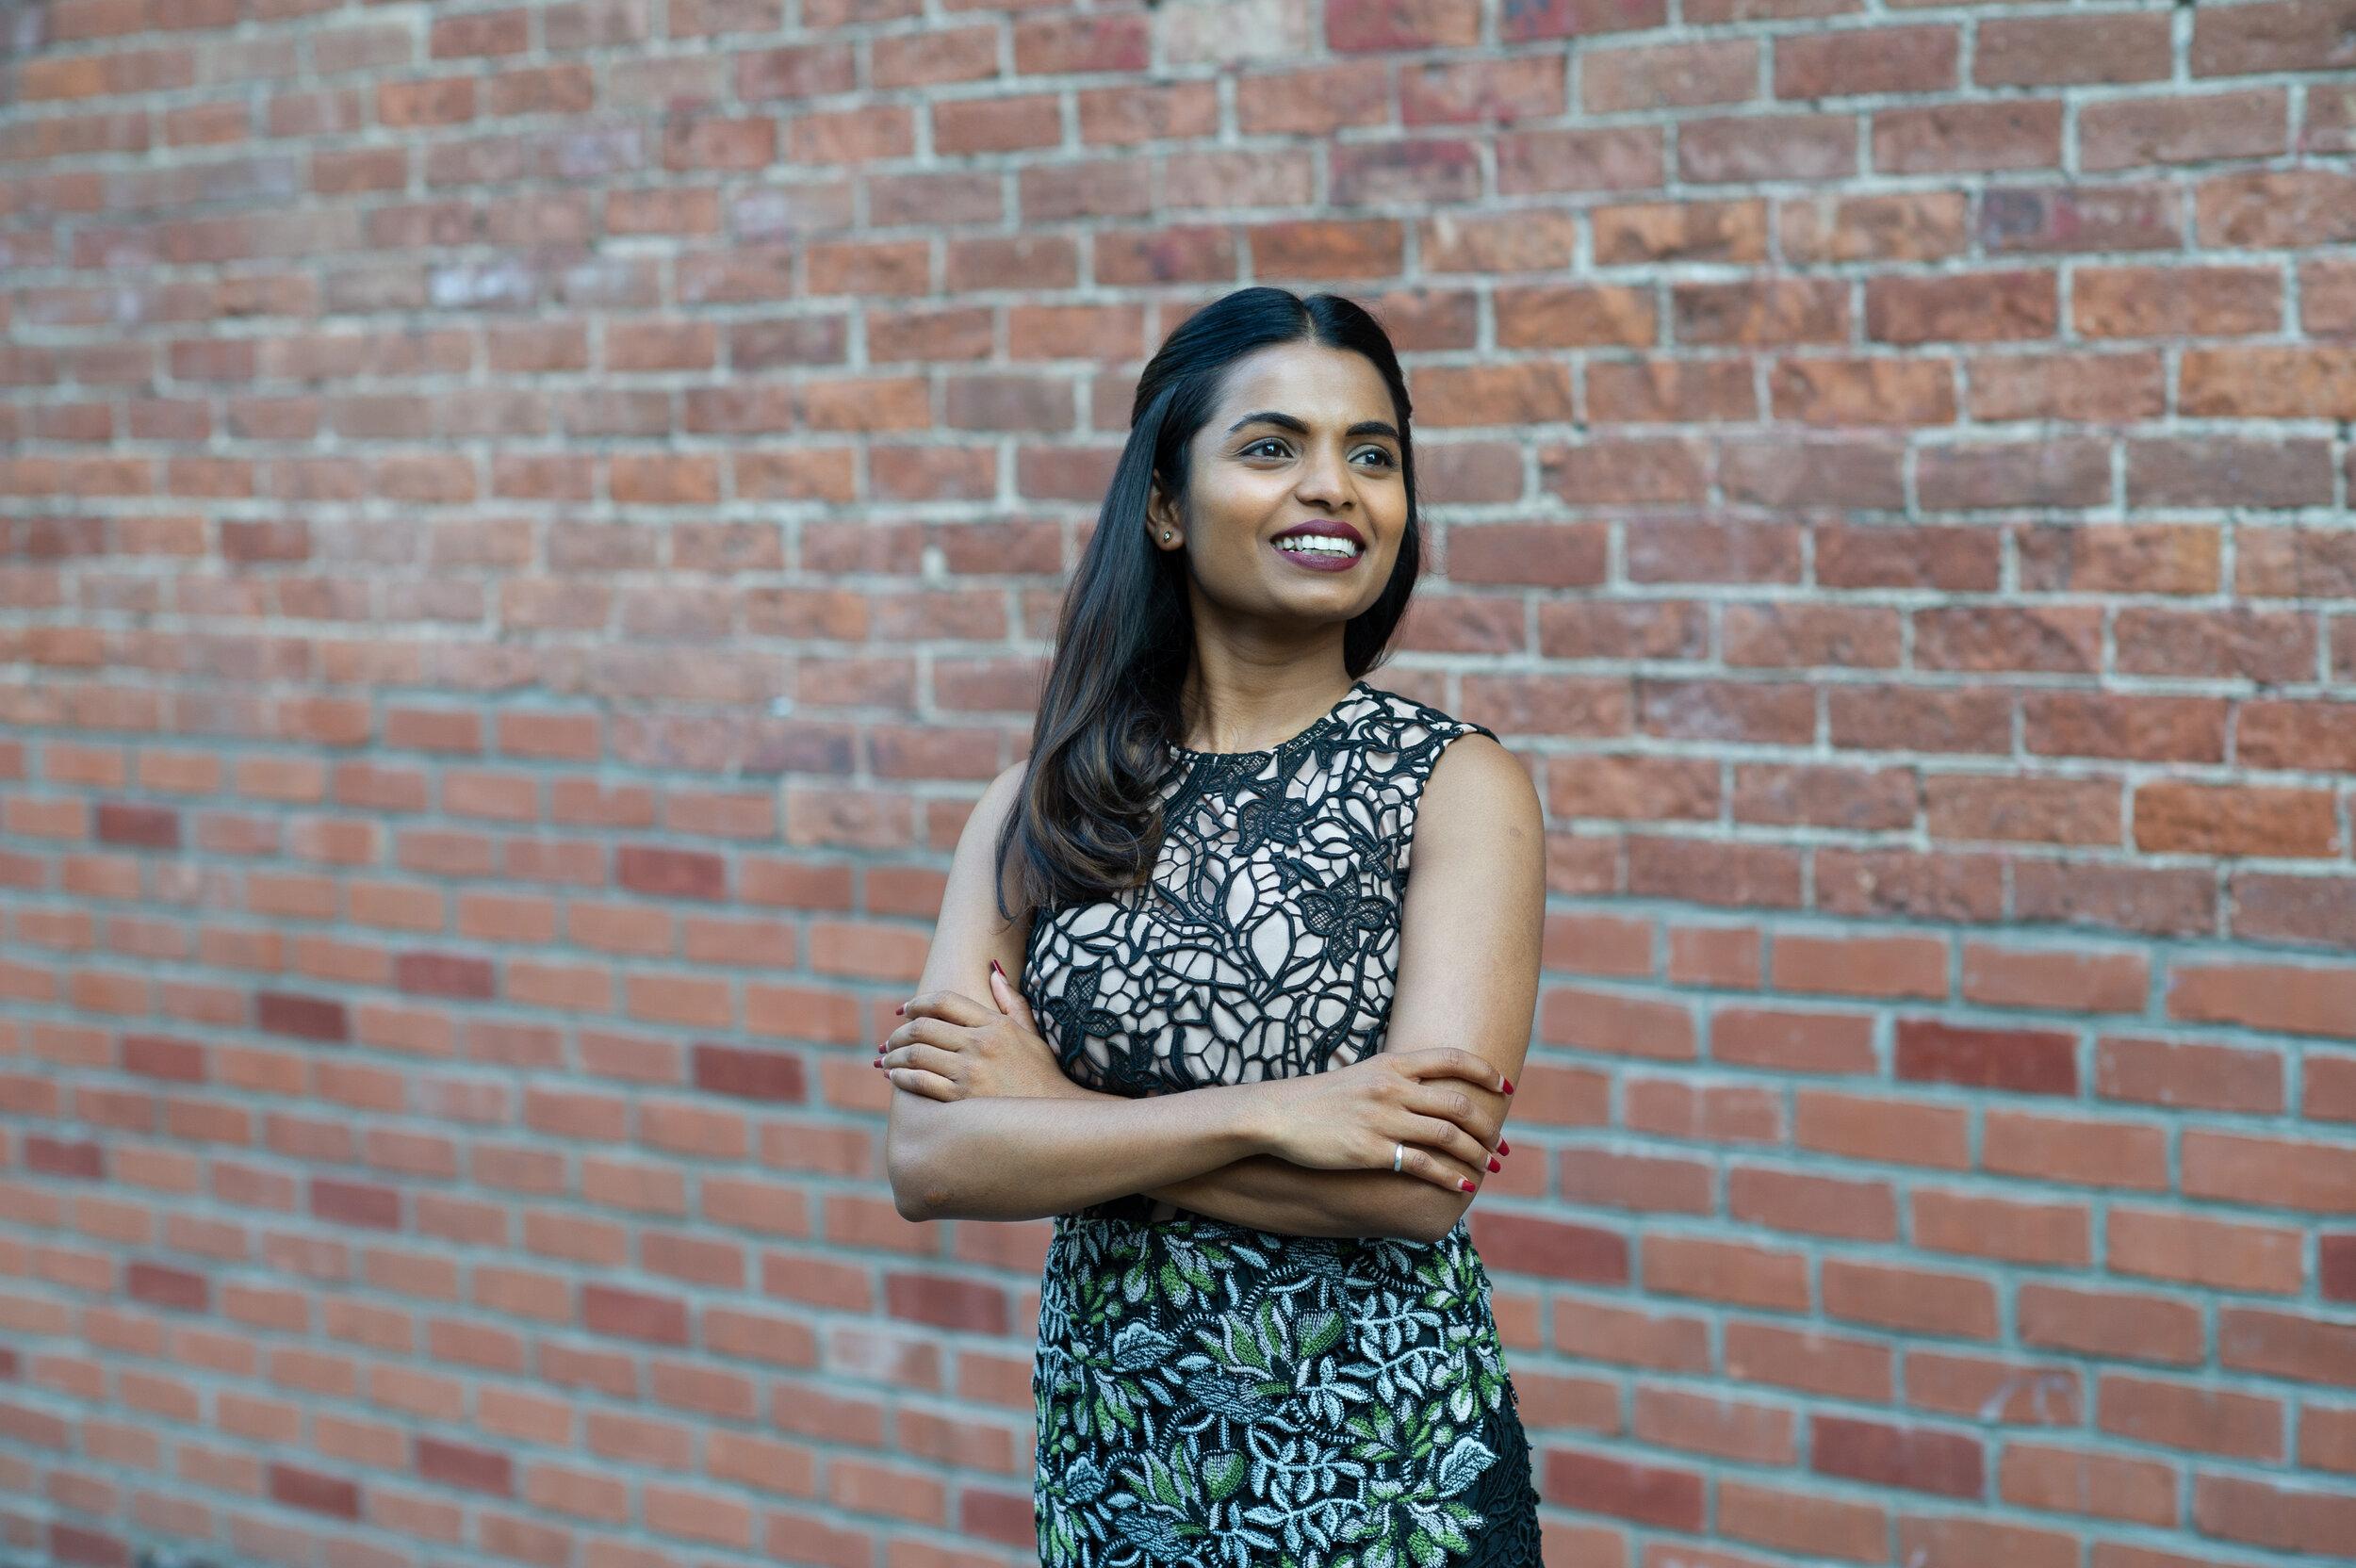 Vineetha Sivathasan - Kohn Partnership ArchitectsM.Arch., B.A (Hons)